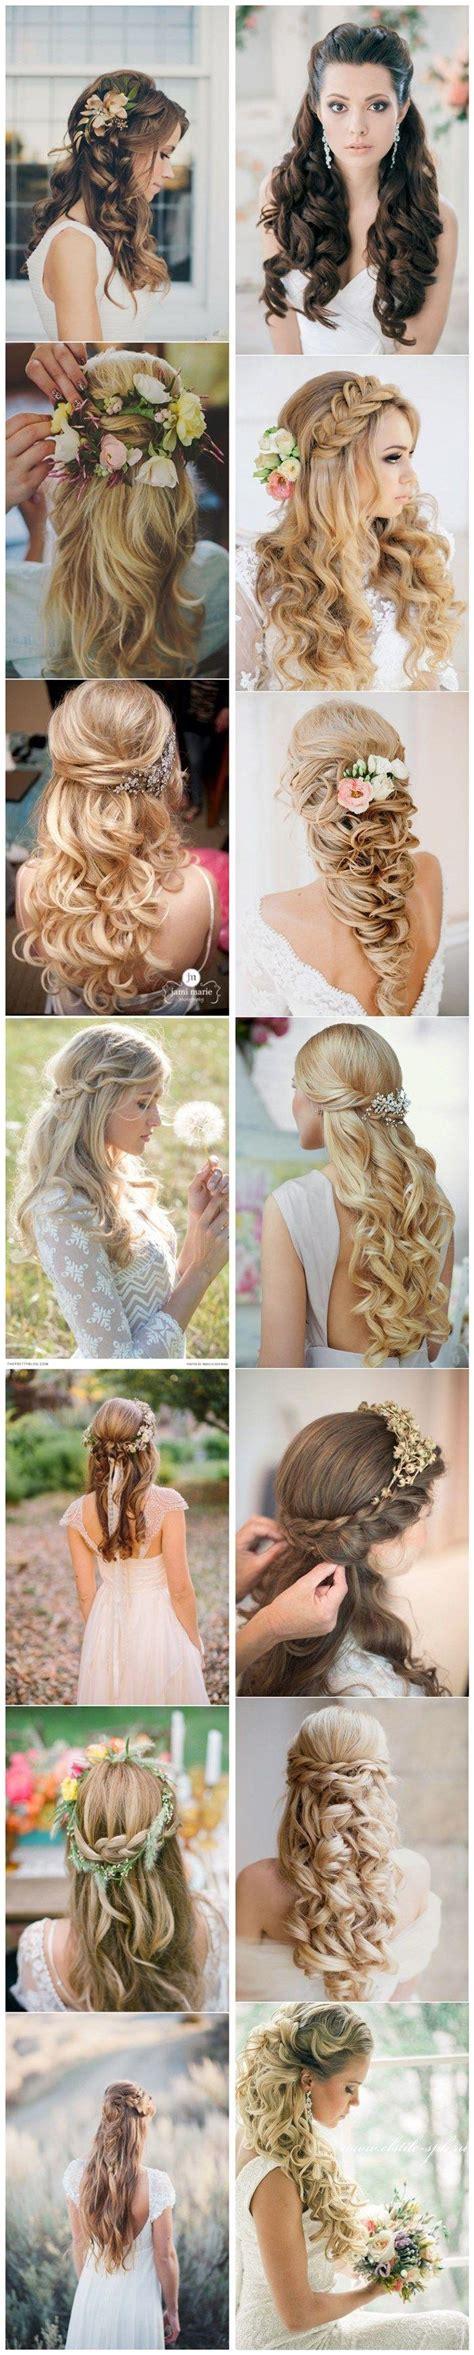 Half Up Half Wedding Hairstyles Tutorial by 40 Stunning Half Up Half Wedding Hairstyles With